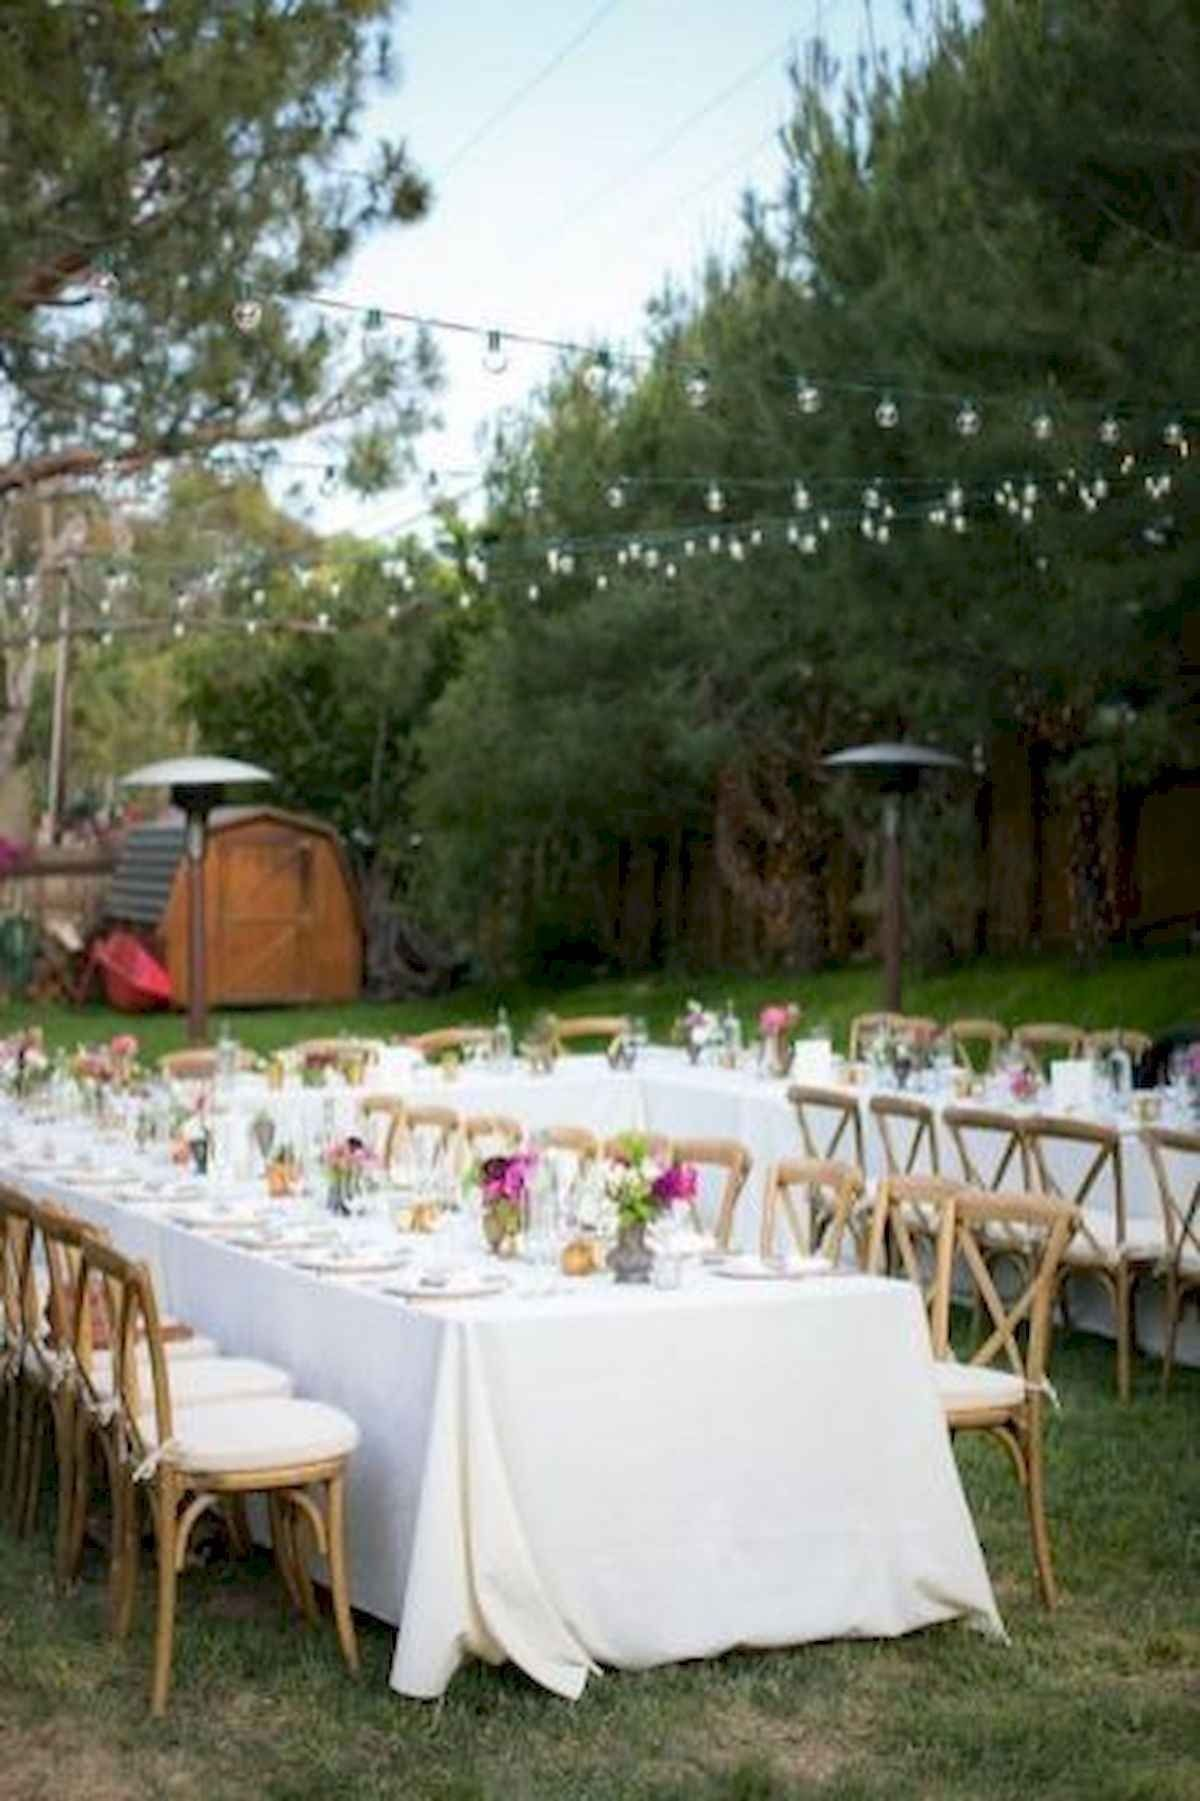 44 Stunning Backyard Wedding Decor Ideas On A Budget | Diy ...